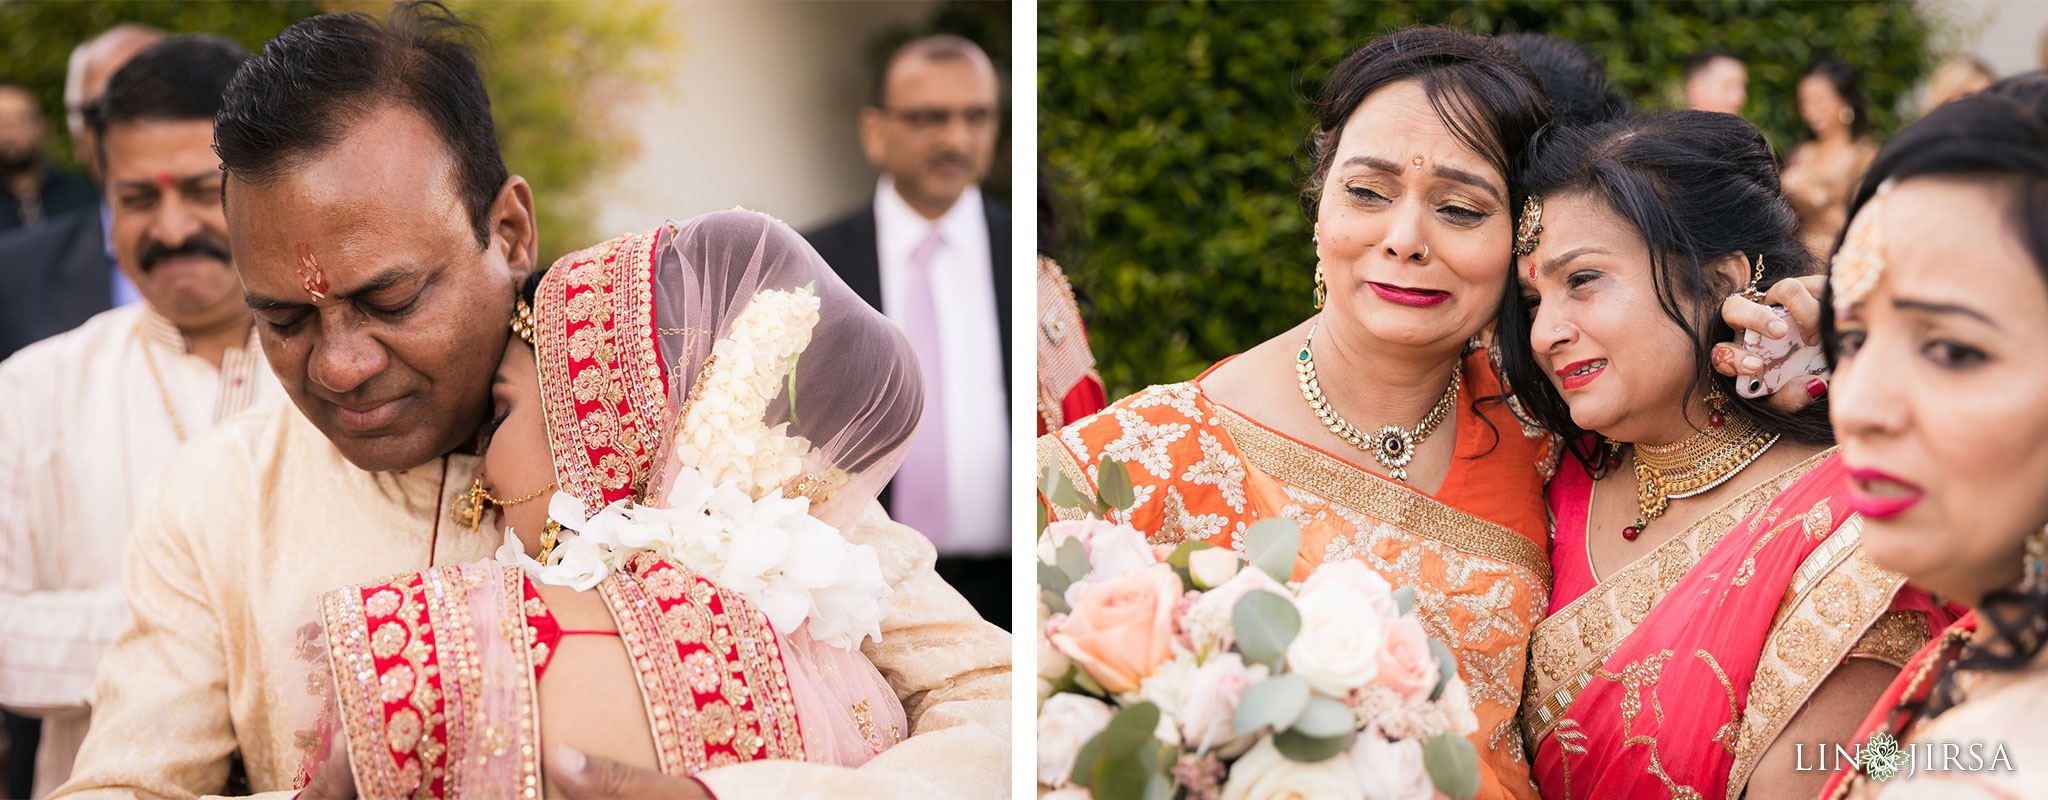 41 four seasons westlake village indian wedding photography